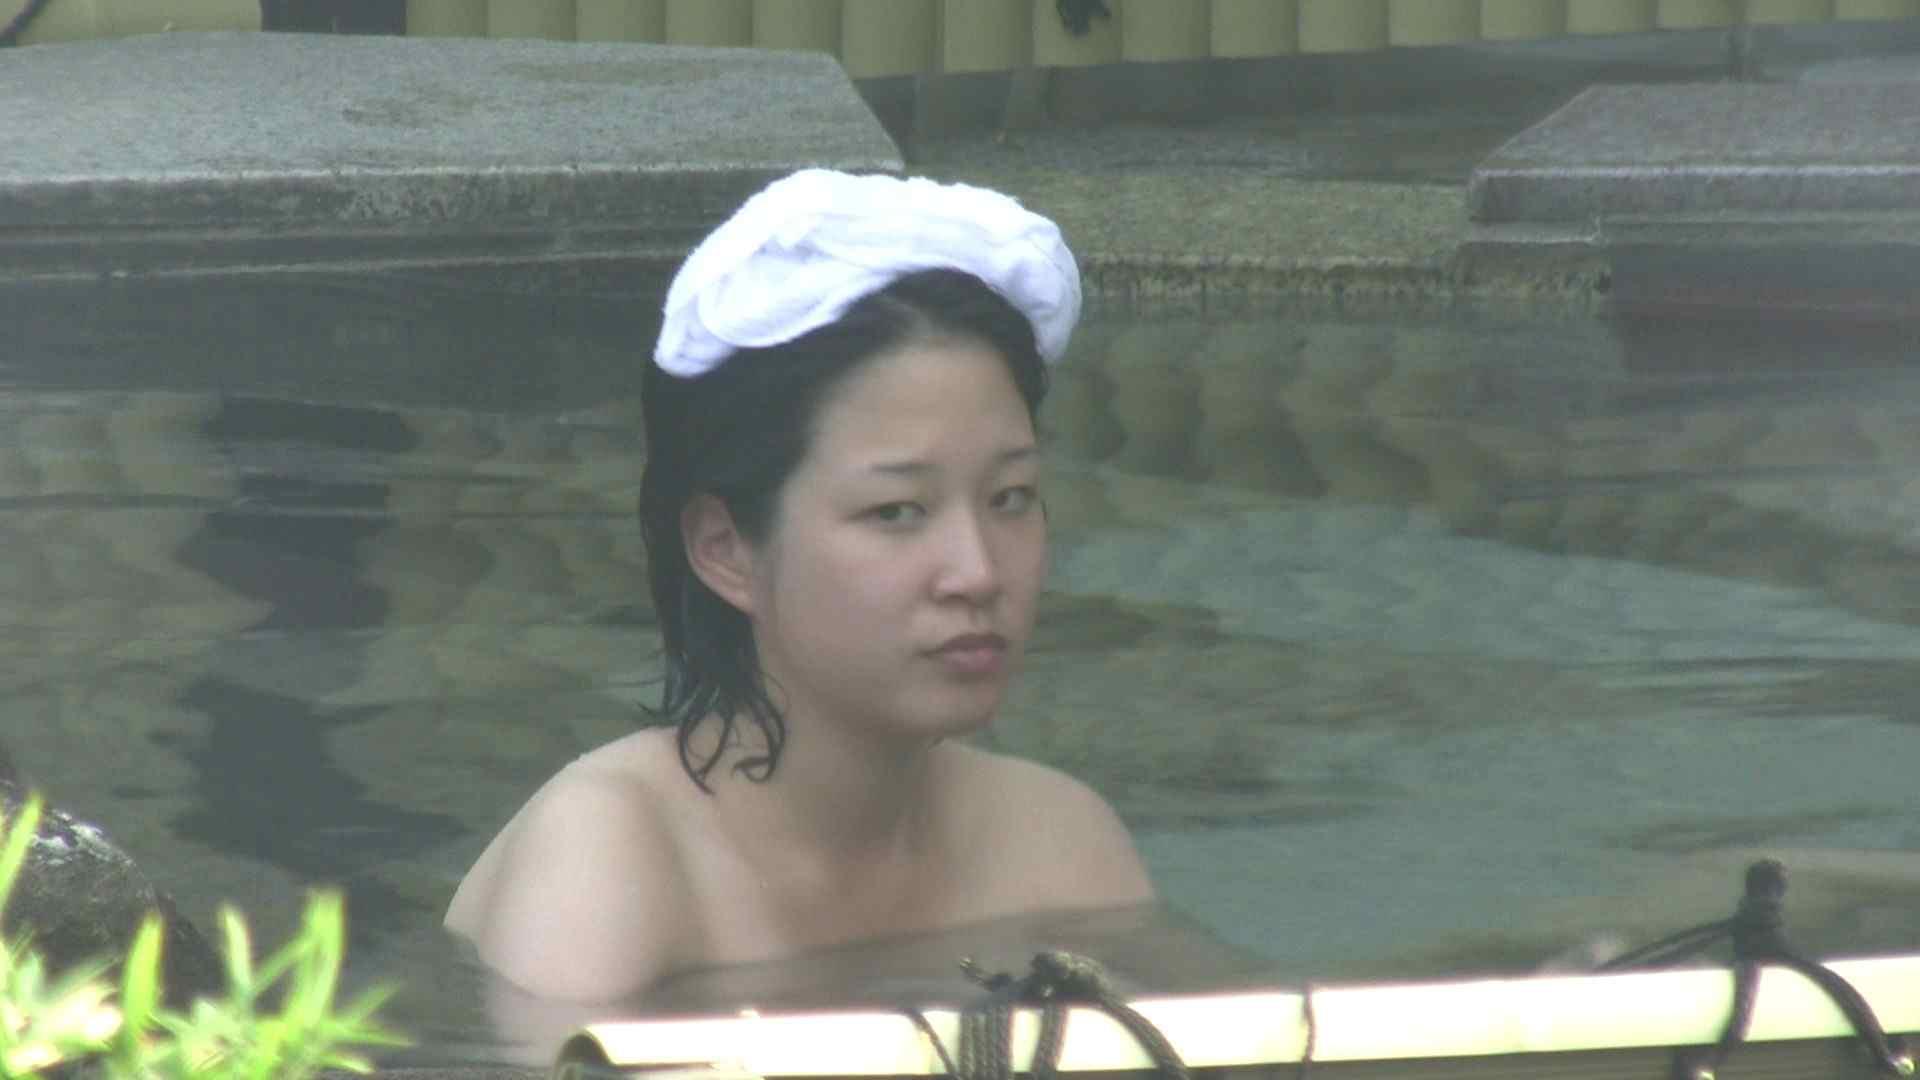 Aquaな露天風呂Vol.172 盗撮映像  113Pix 98